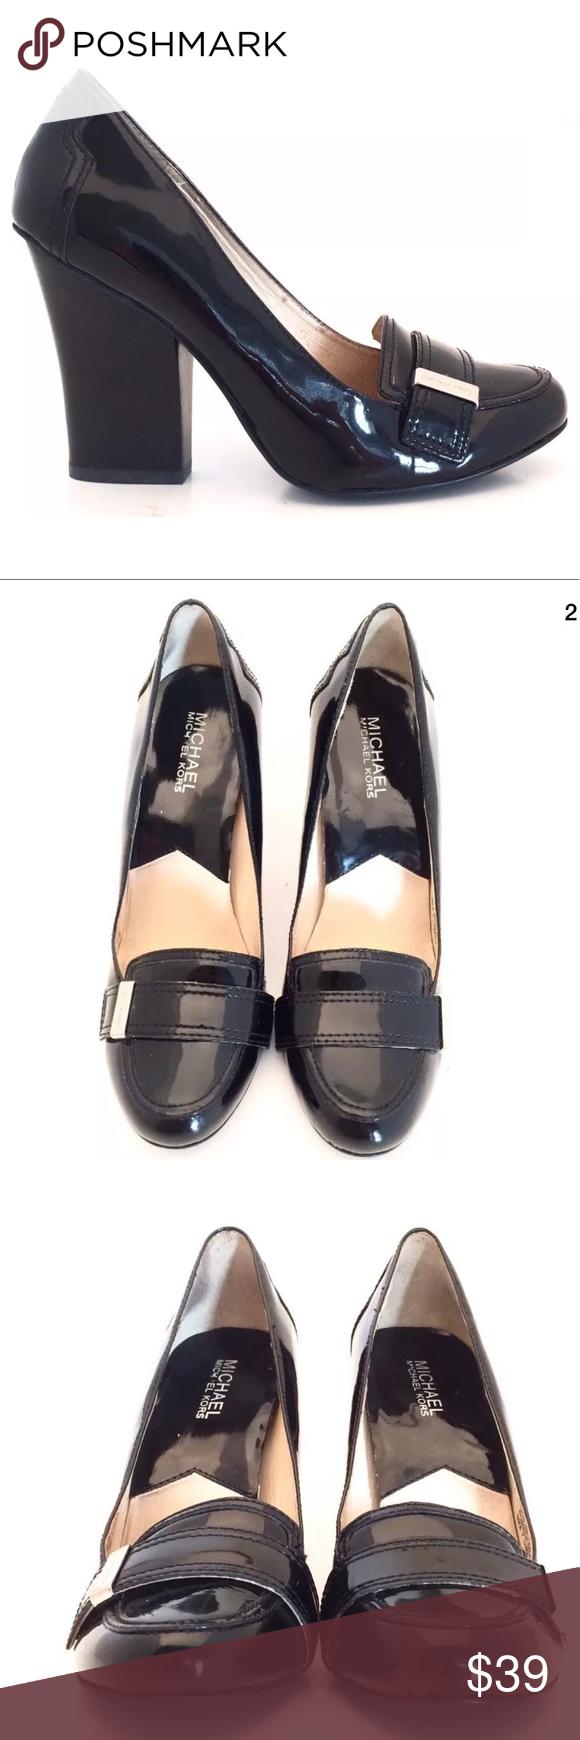 968debac07f Michael Kors Black Patent Chunky Heel Pumps Michael Kors Women s Black  Patent Leather Chunky Heel Pumps Size 7.5M 4